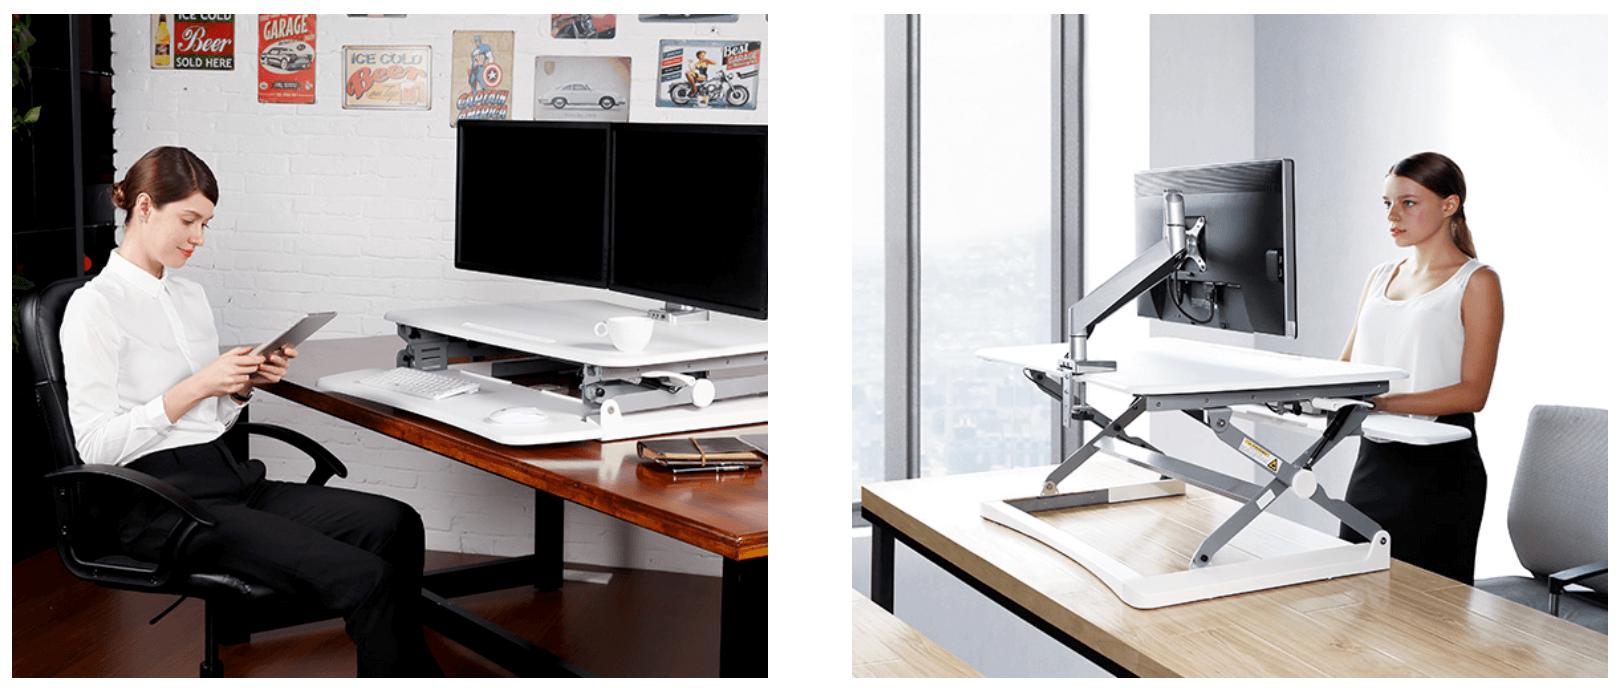 FLEXISPOT 座位・立位両用スタンディングデスク 画像4